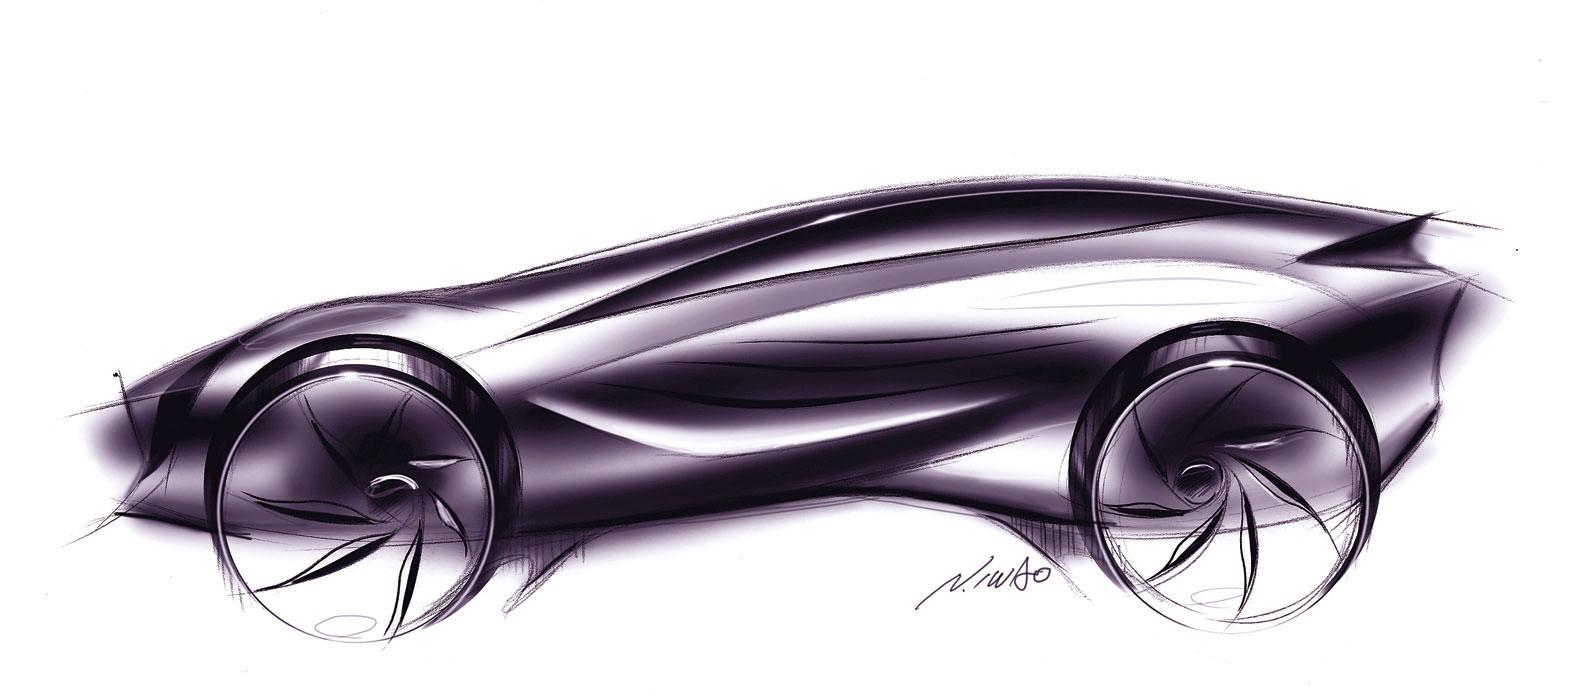 http://www.carbodydesign.com/archive/2008/08/27-mazda-kazamai-concept/Mazda-Kazamai-Concept-design-sketch-4-lg.jpg